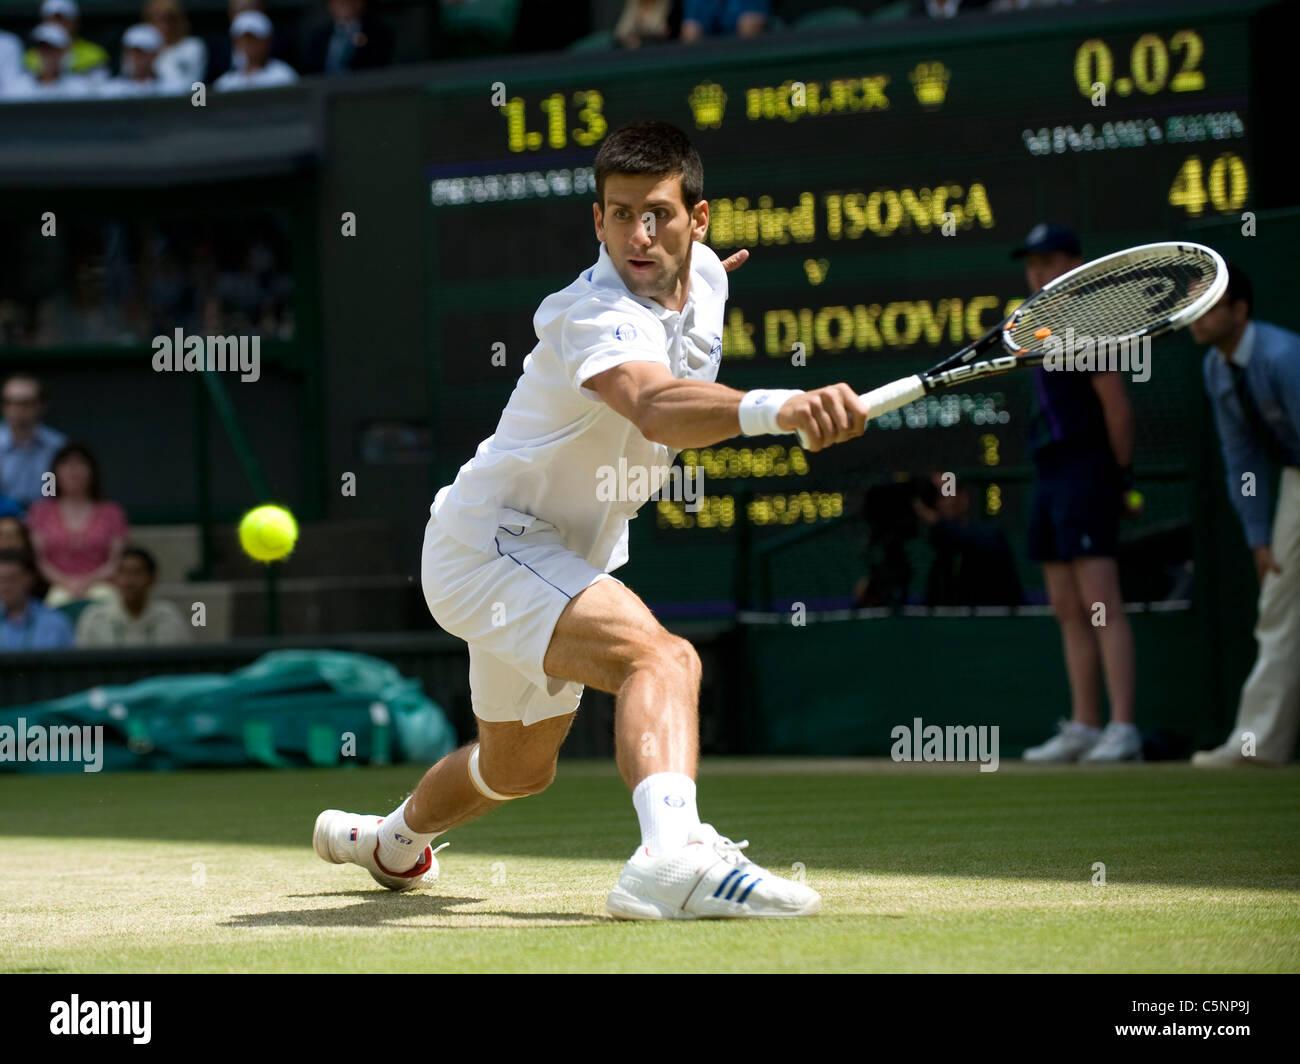 Novak Djokovic (SRB) in action during the Wimbledon Tennis Championships 2011  - Stock Image